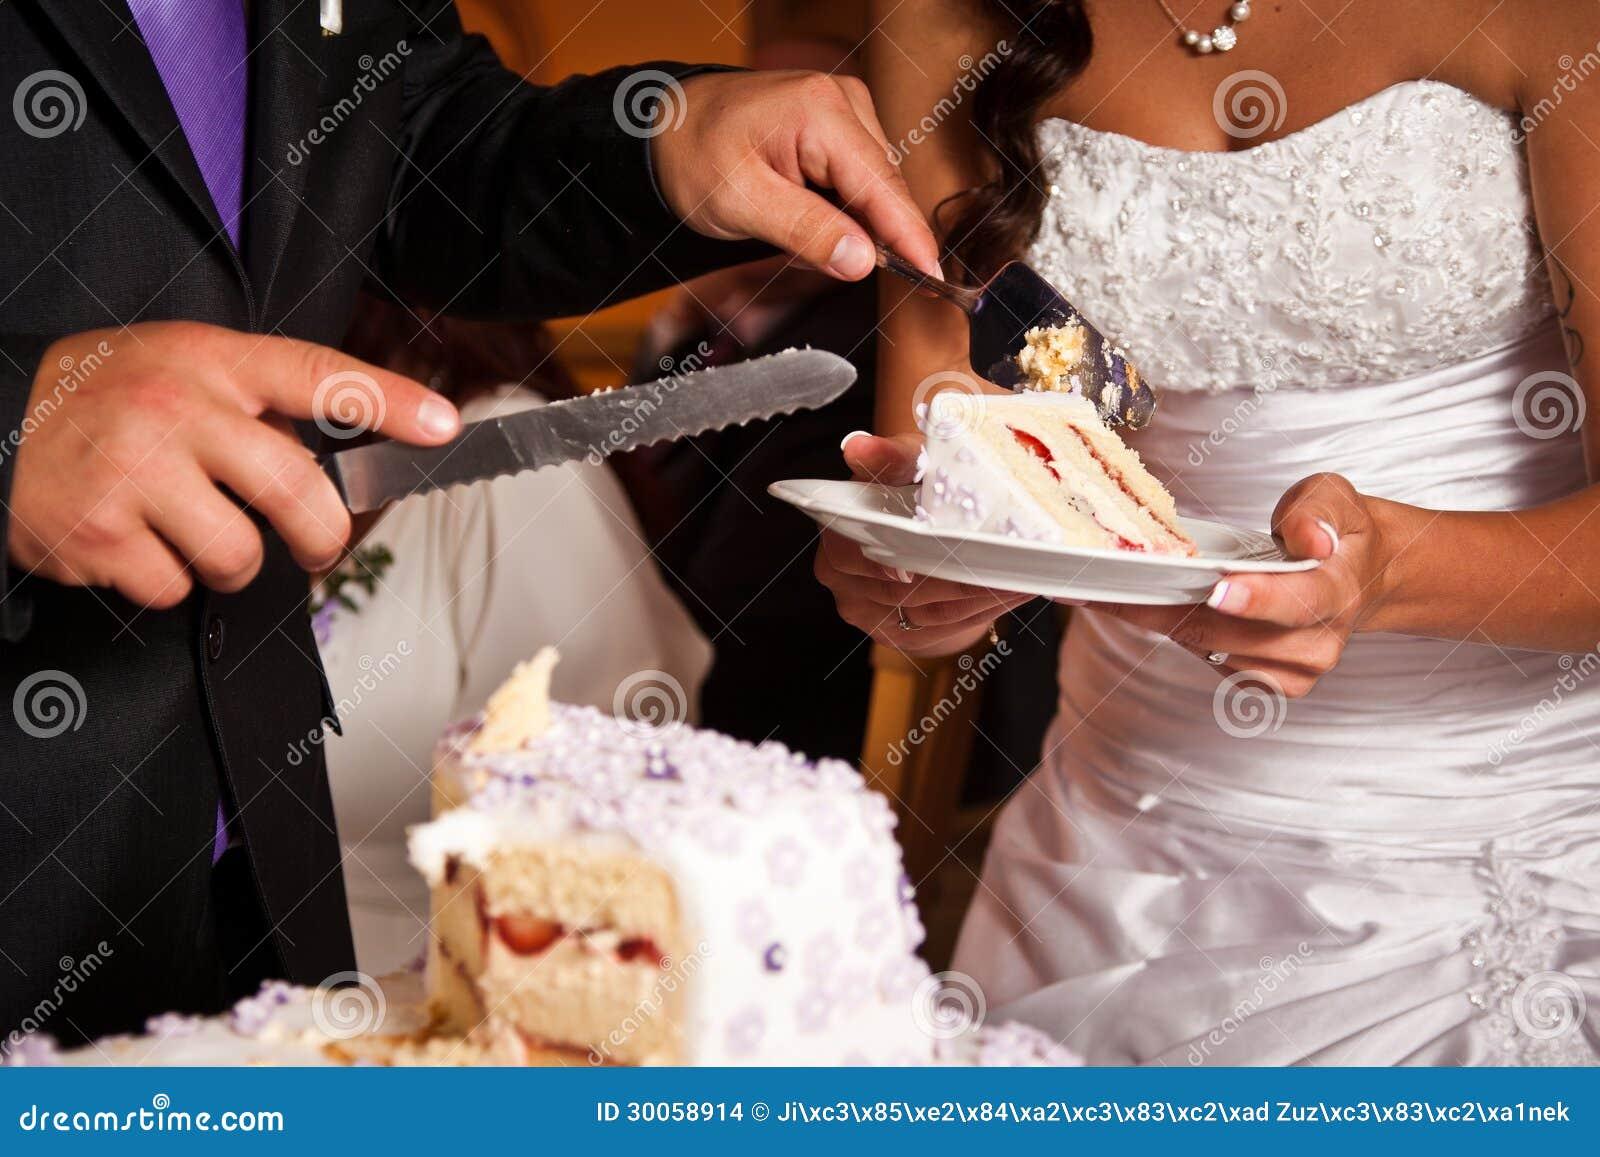 Cutting The Wedding Cake Stock Images